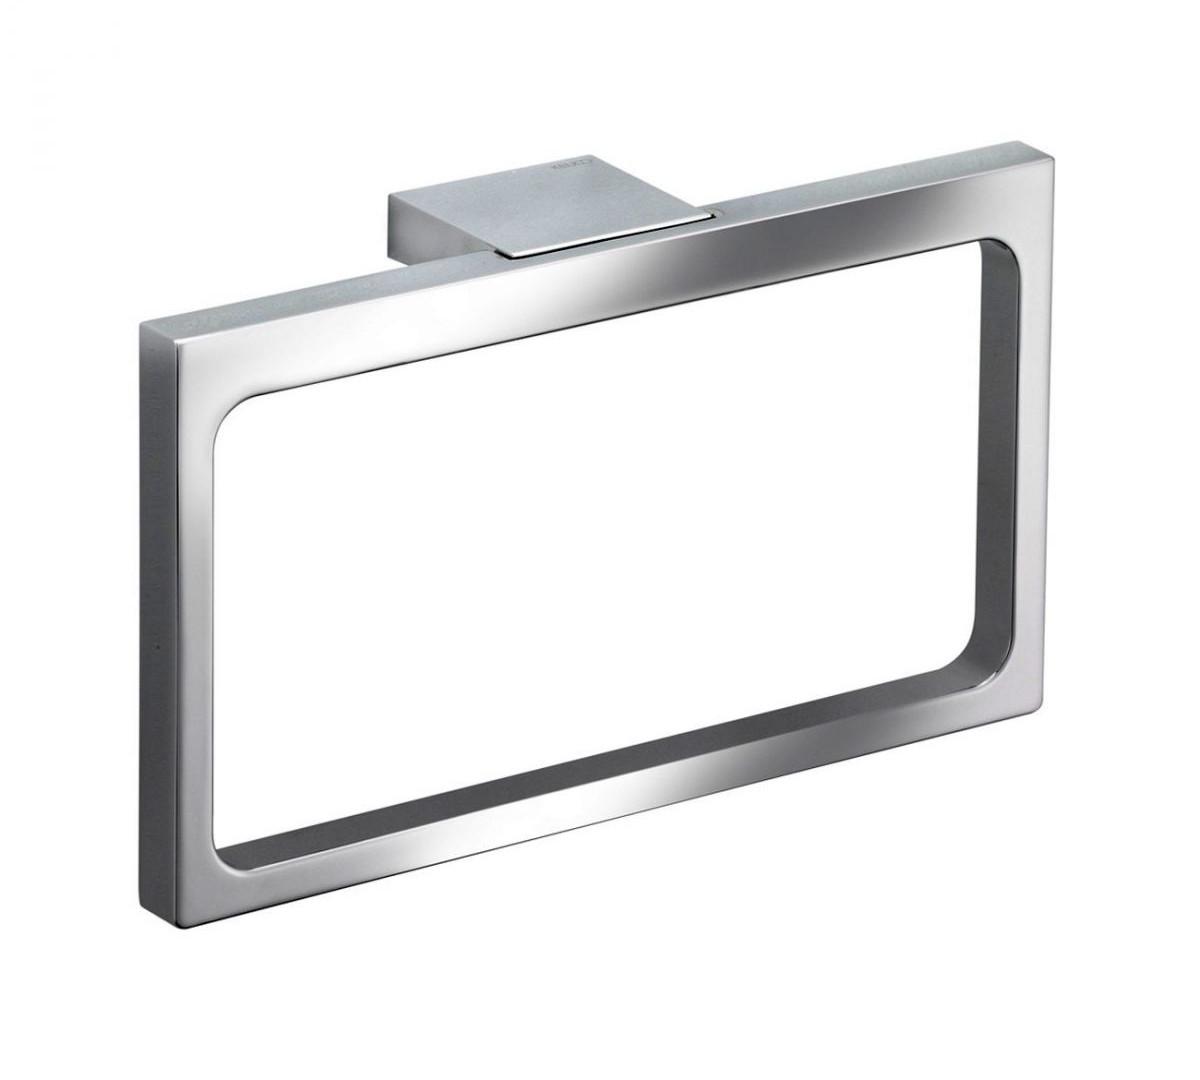 Keuco Edition 11 Towel Ring Chrome-Plate